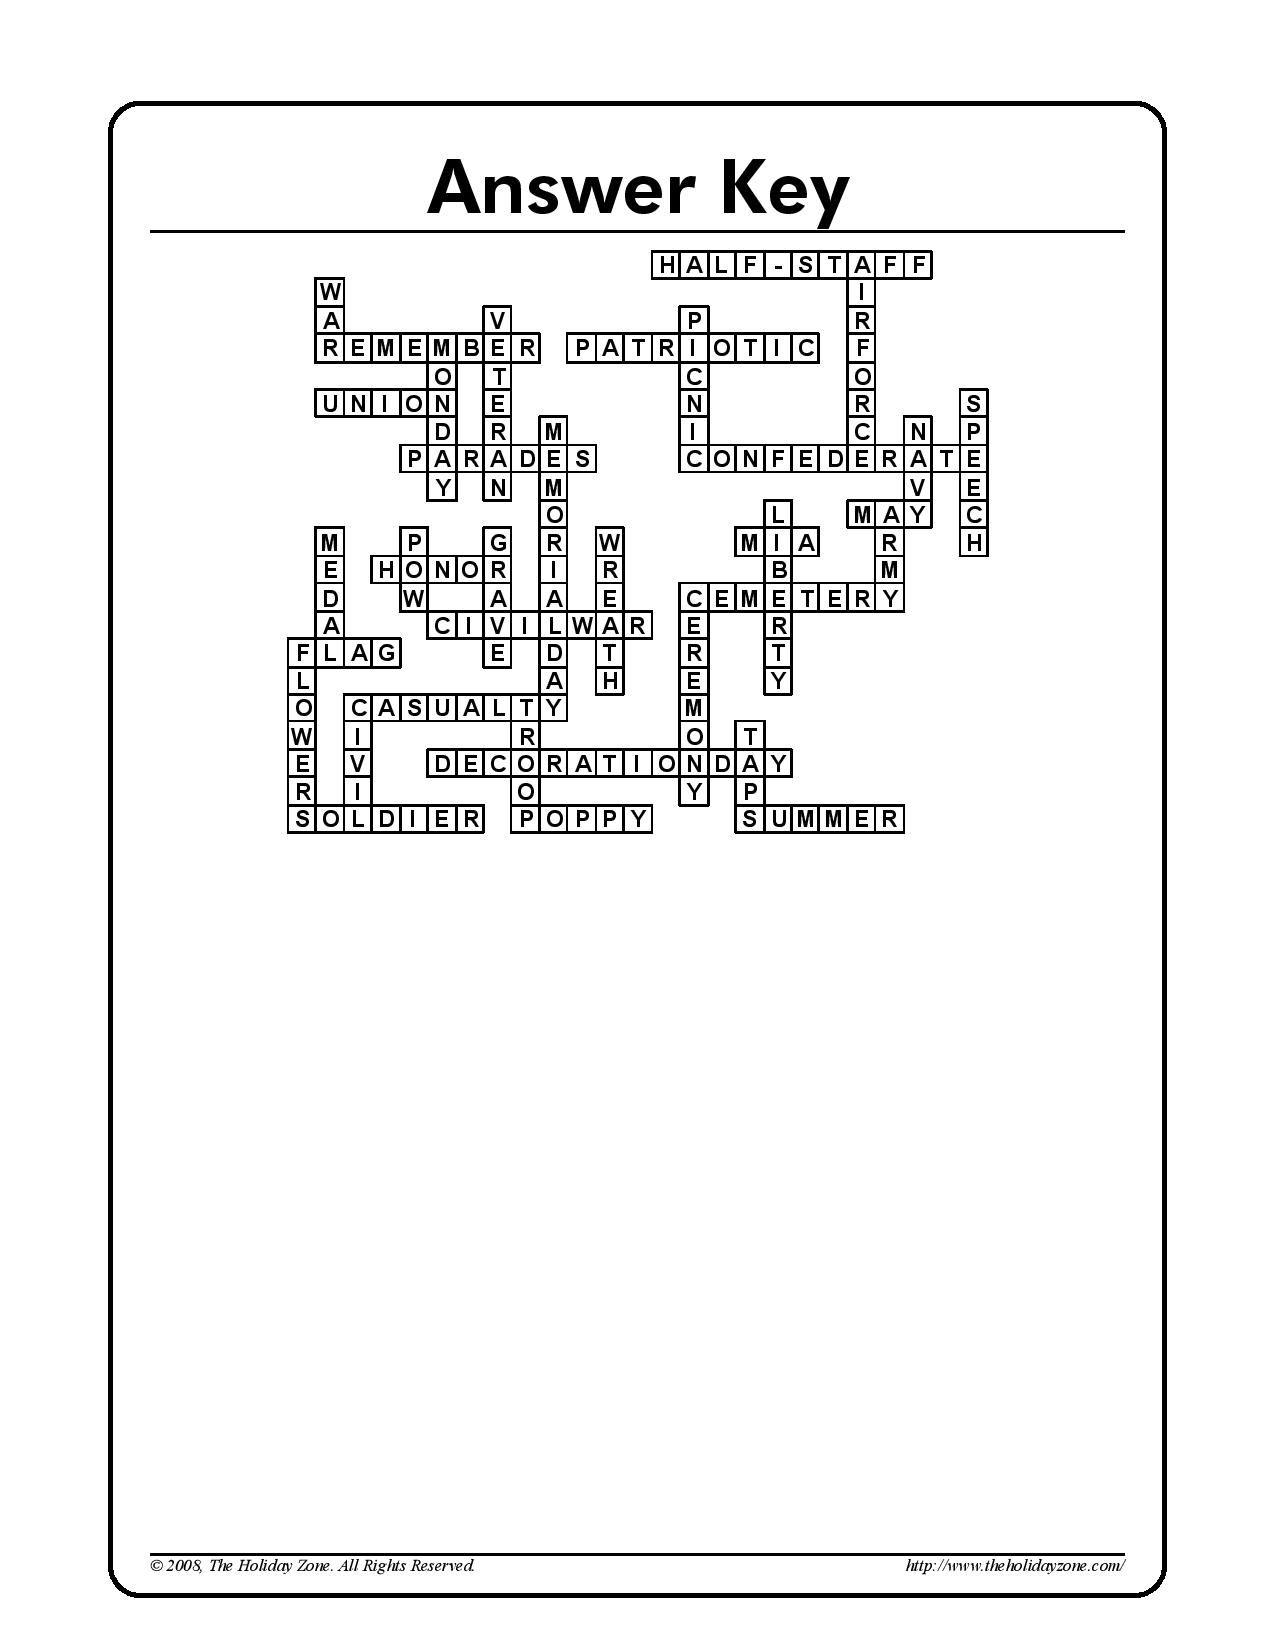 Memorial Day Crossword Puzzle Printable